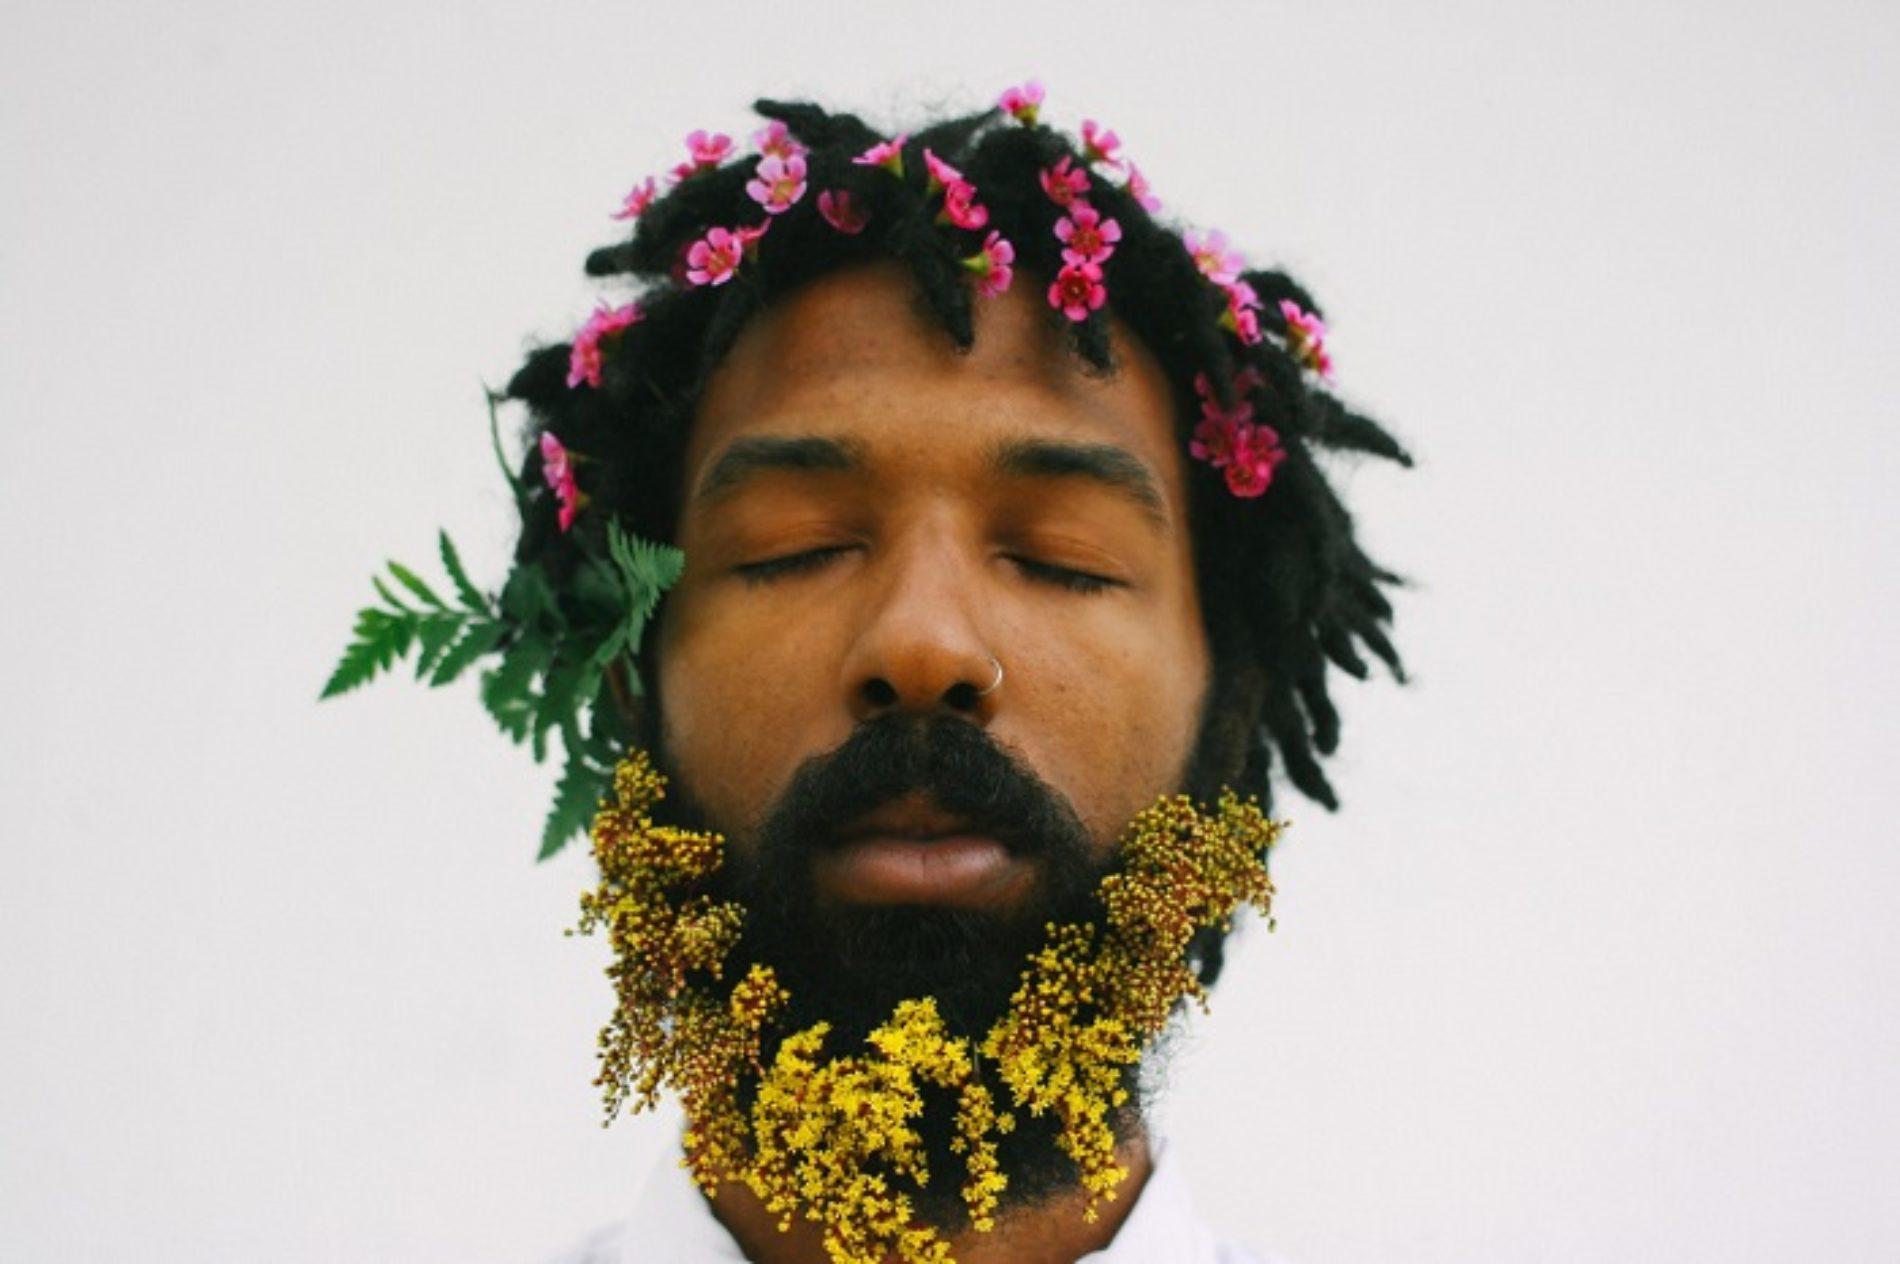 FLOWERS ON HIS HEAD